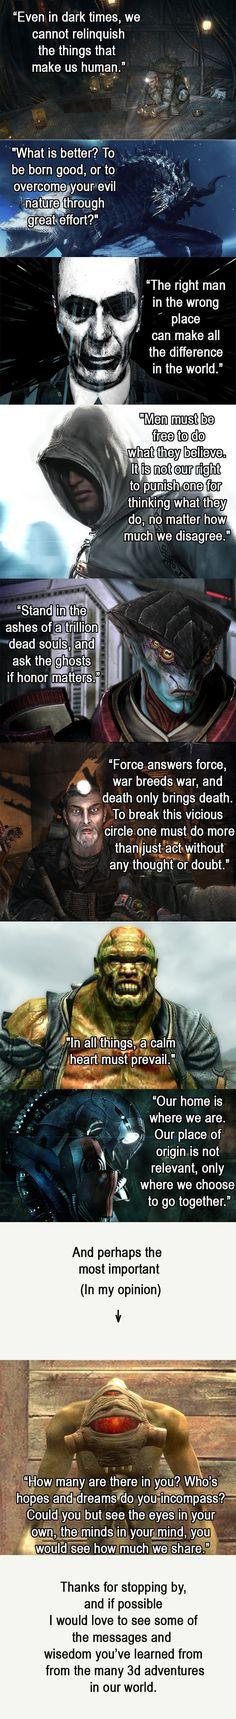 Video Game Philosophy Quotes - Imgur